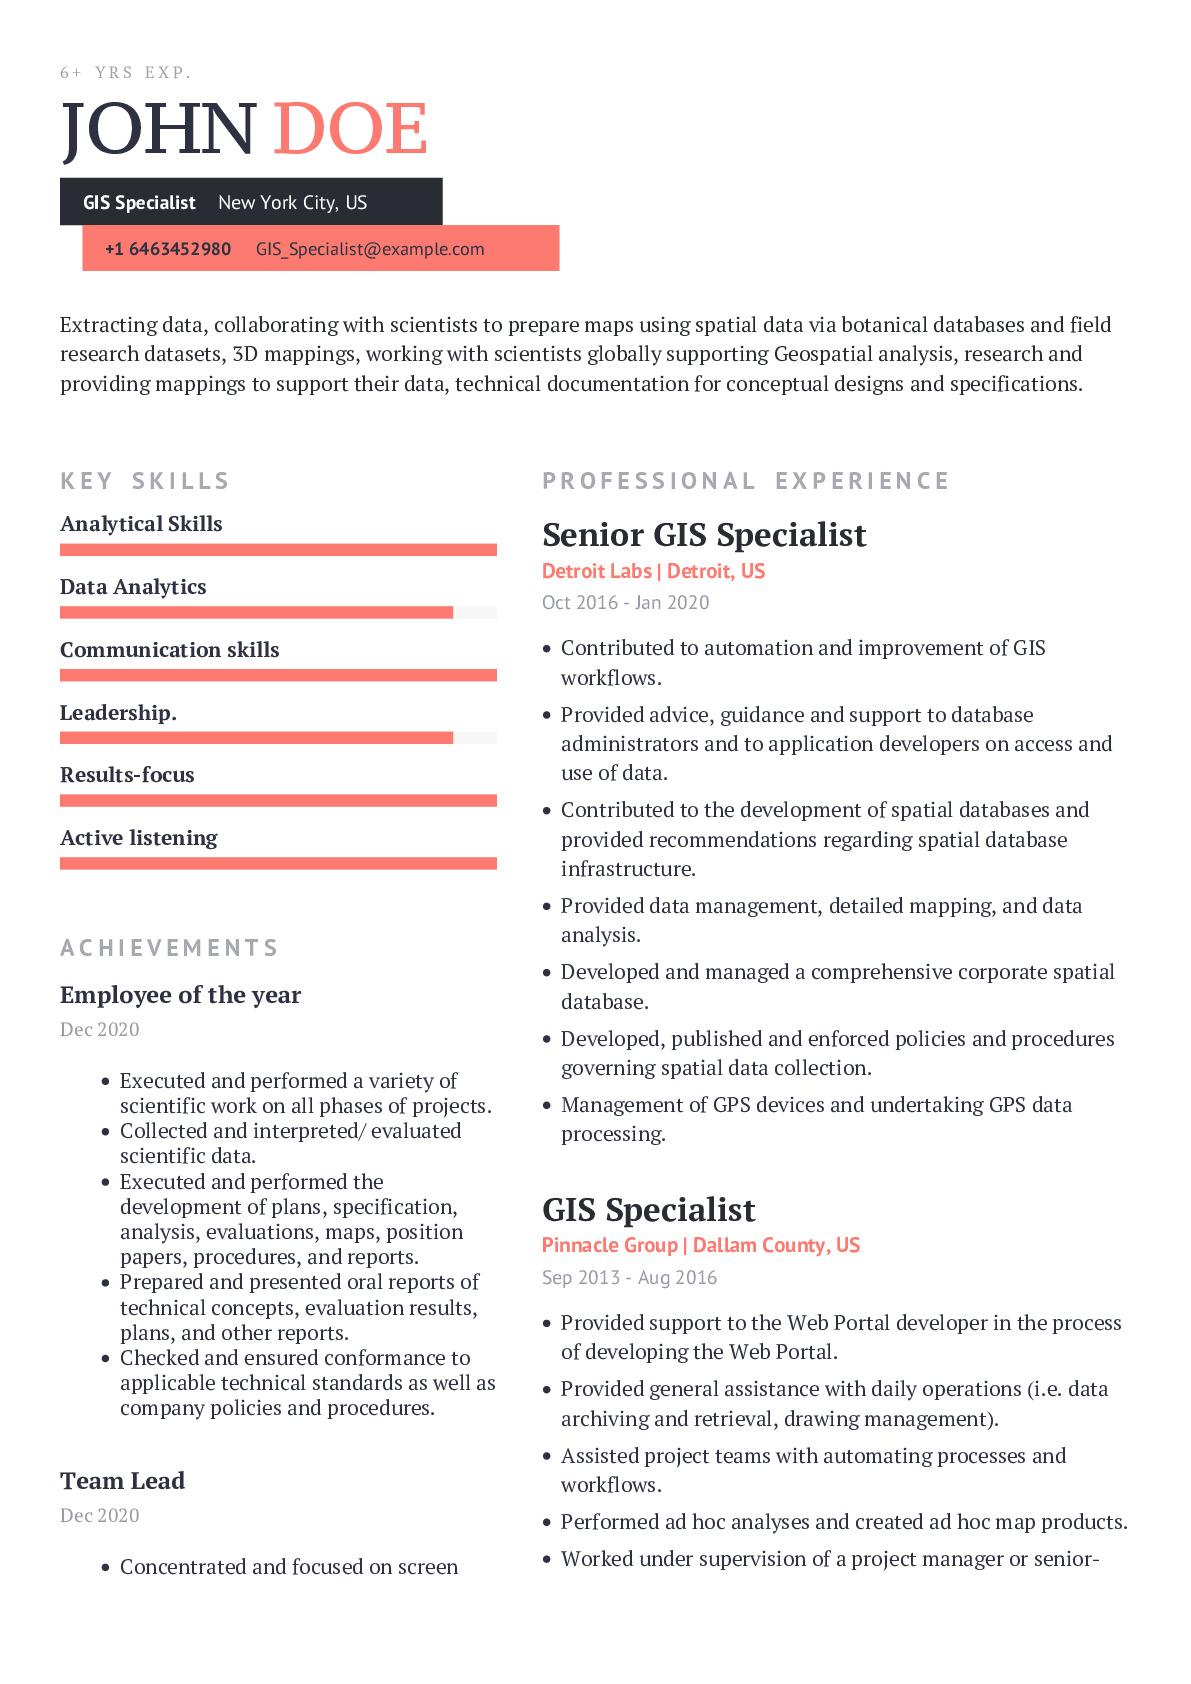 GIS Specialist Resume Example